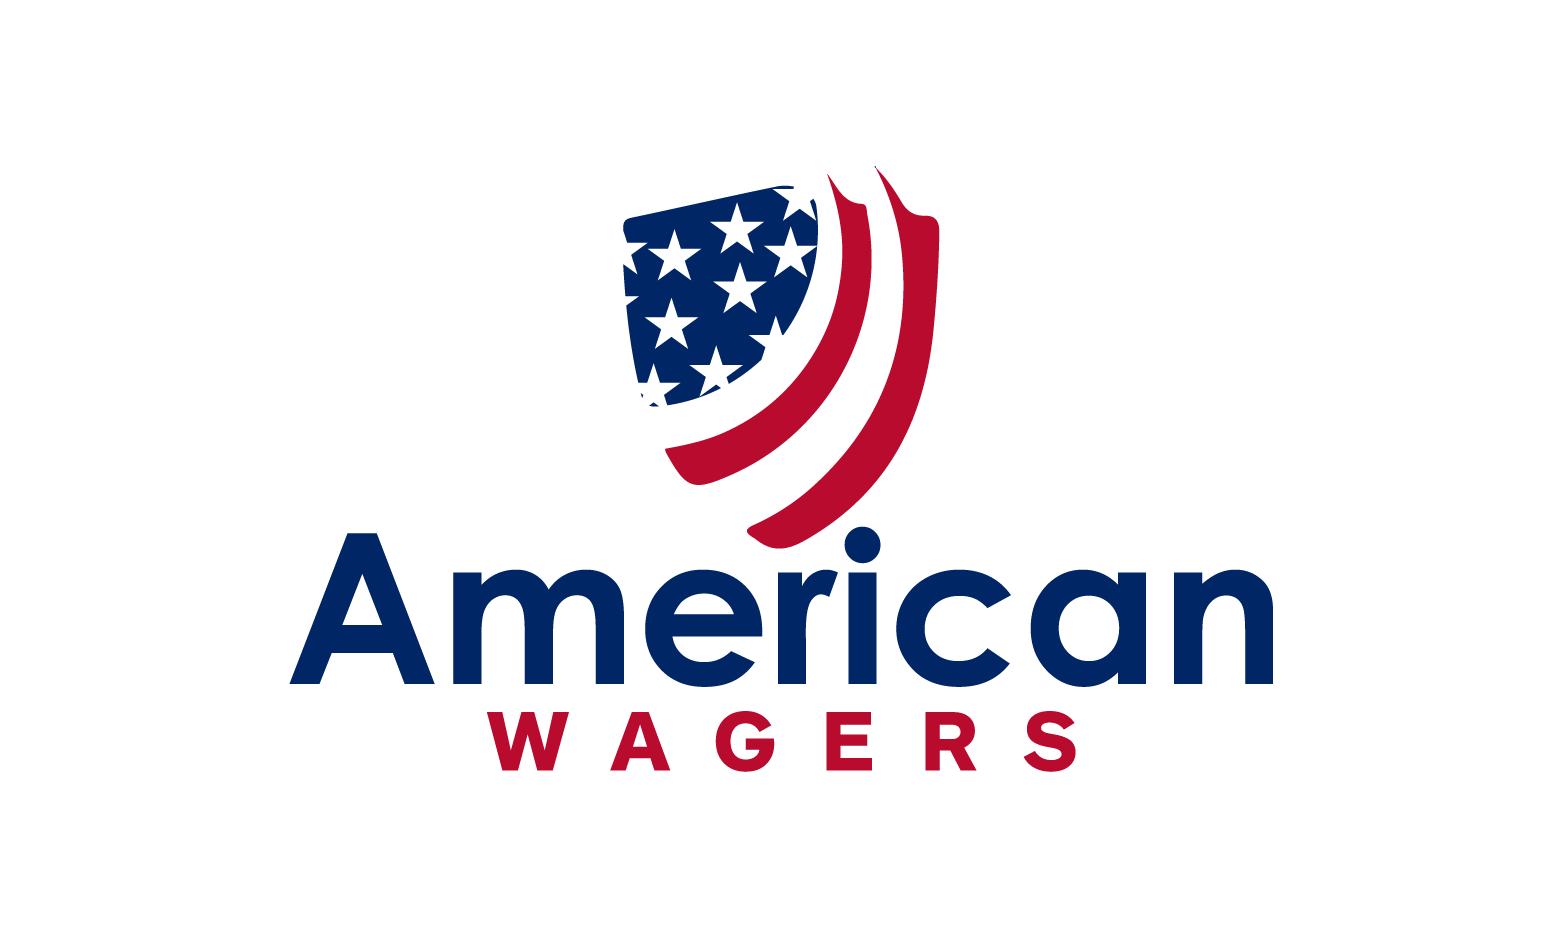 AmericanWagers.com